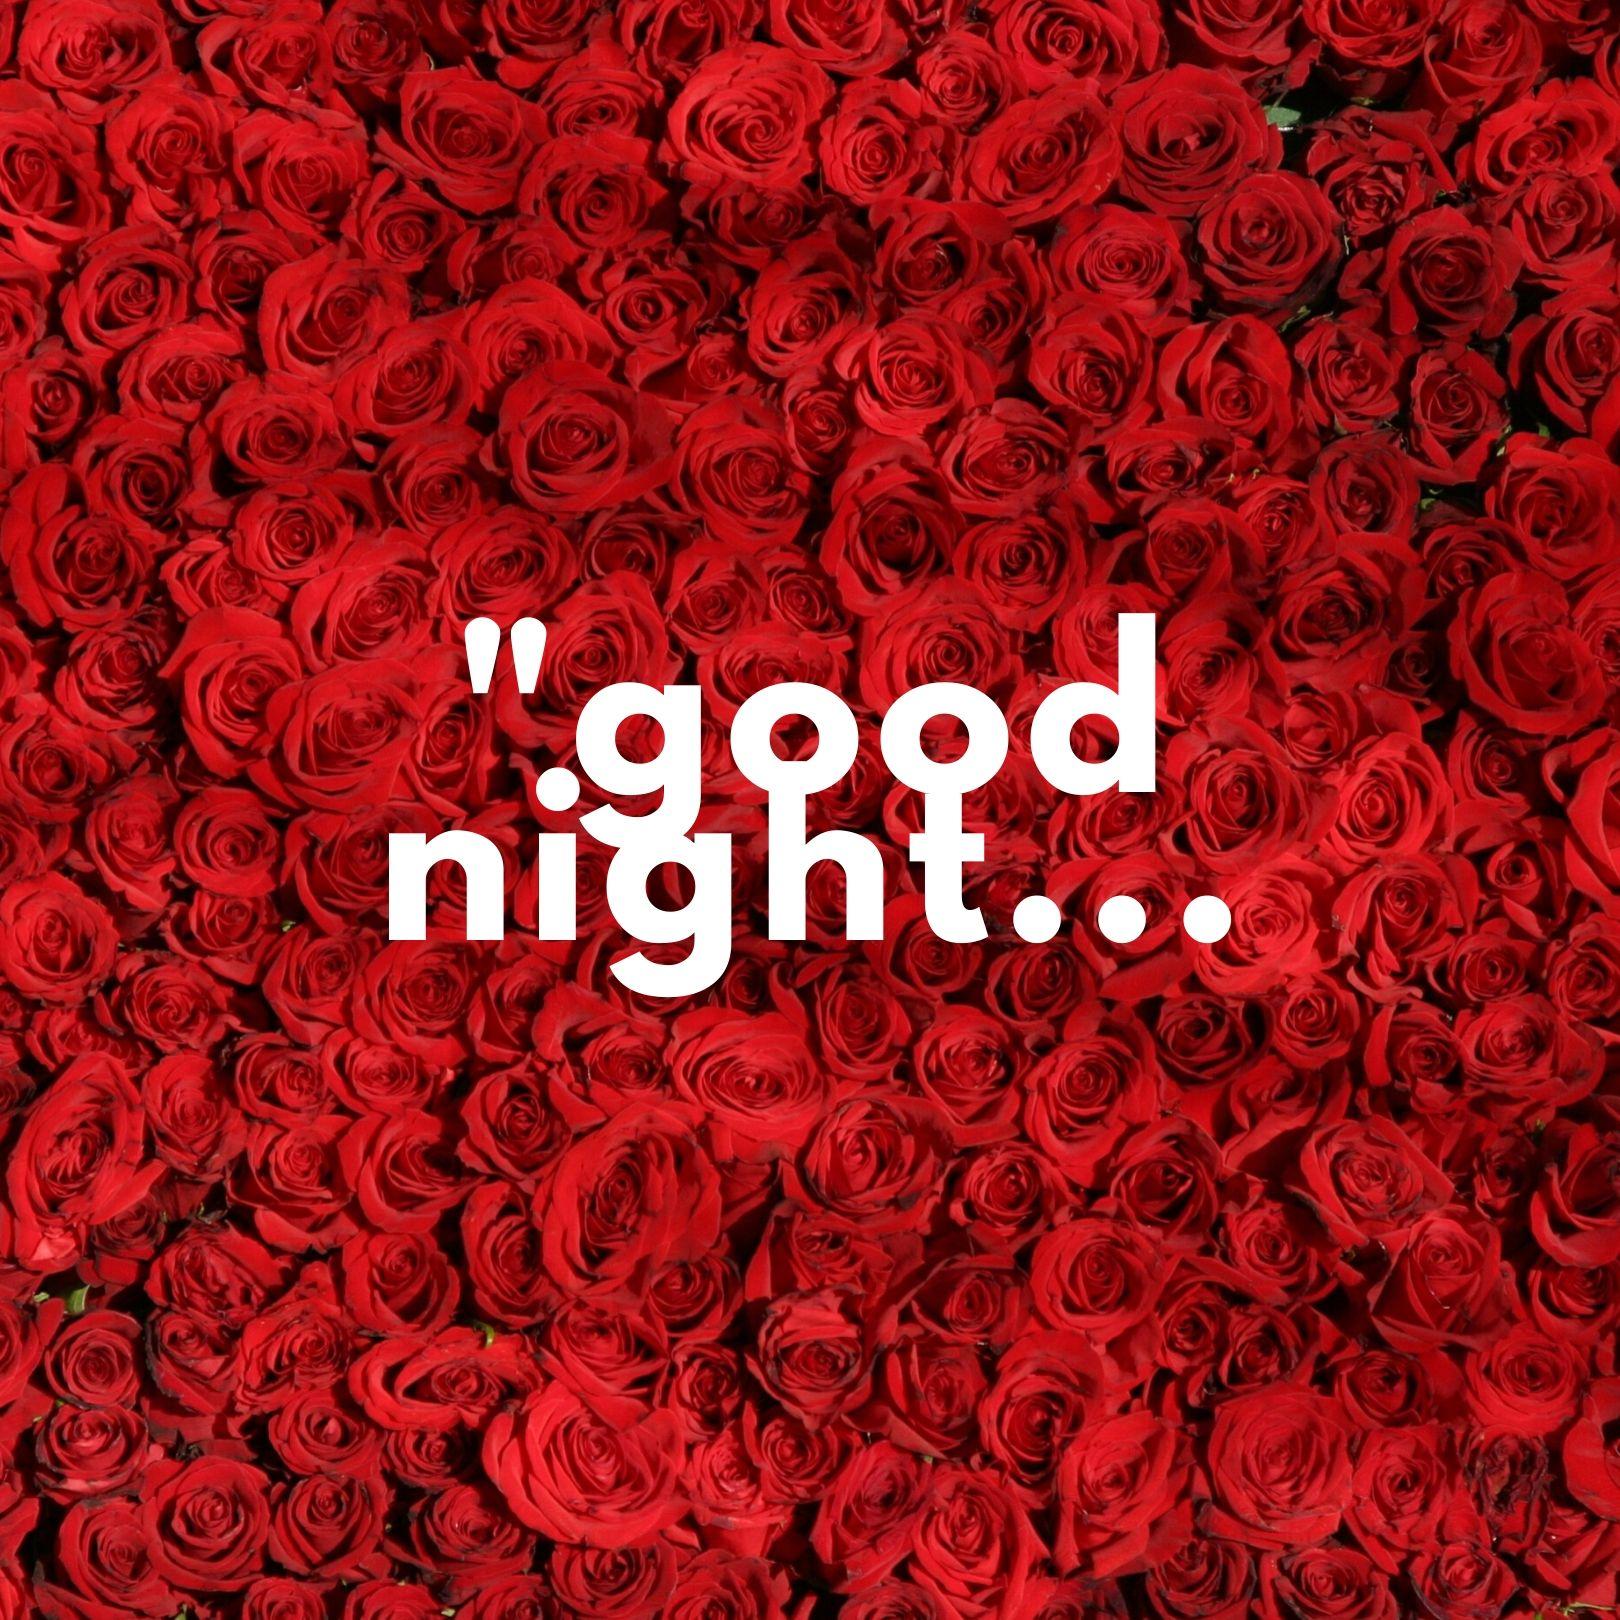 Good Night rose photo hd full HD free download.